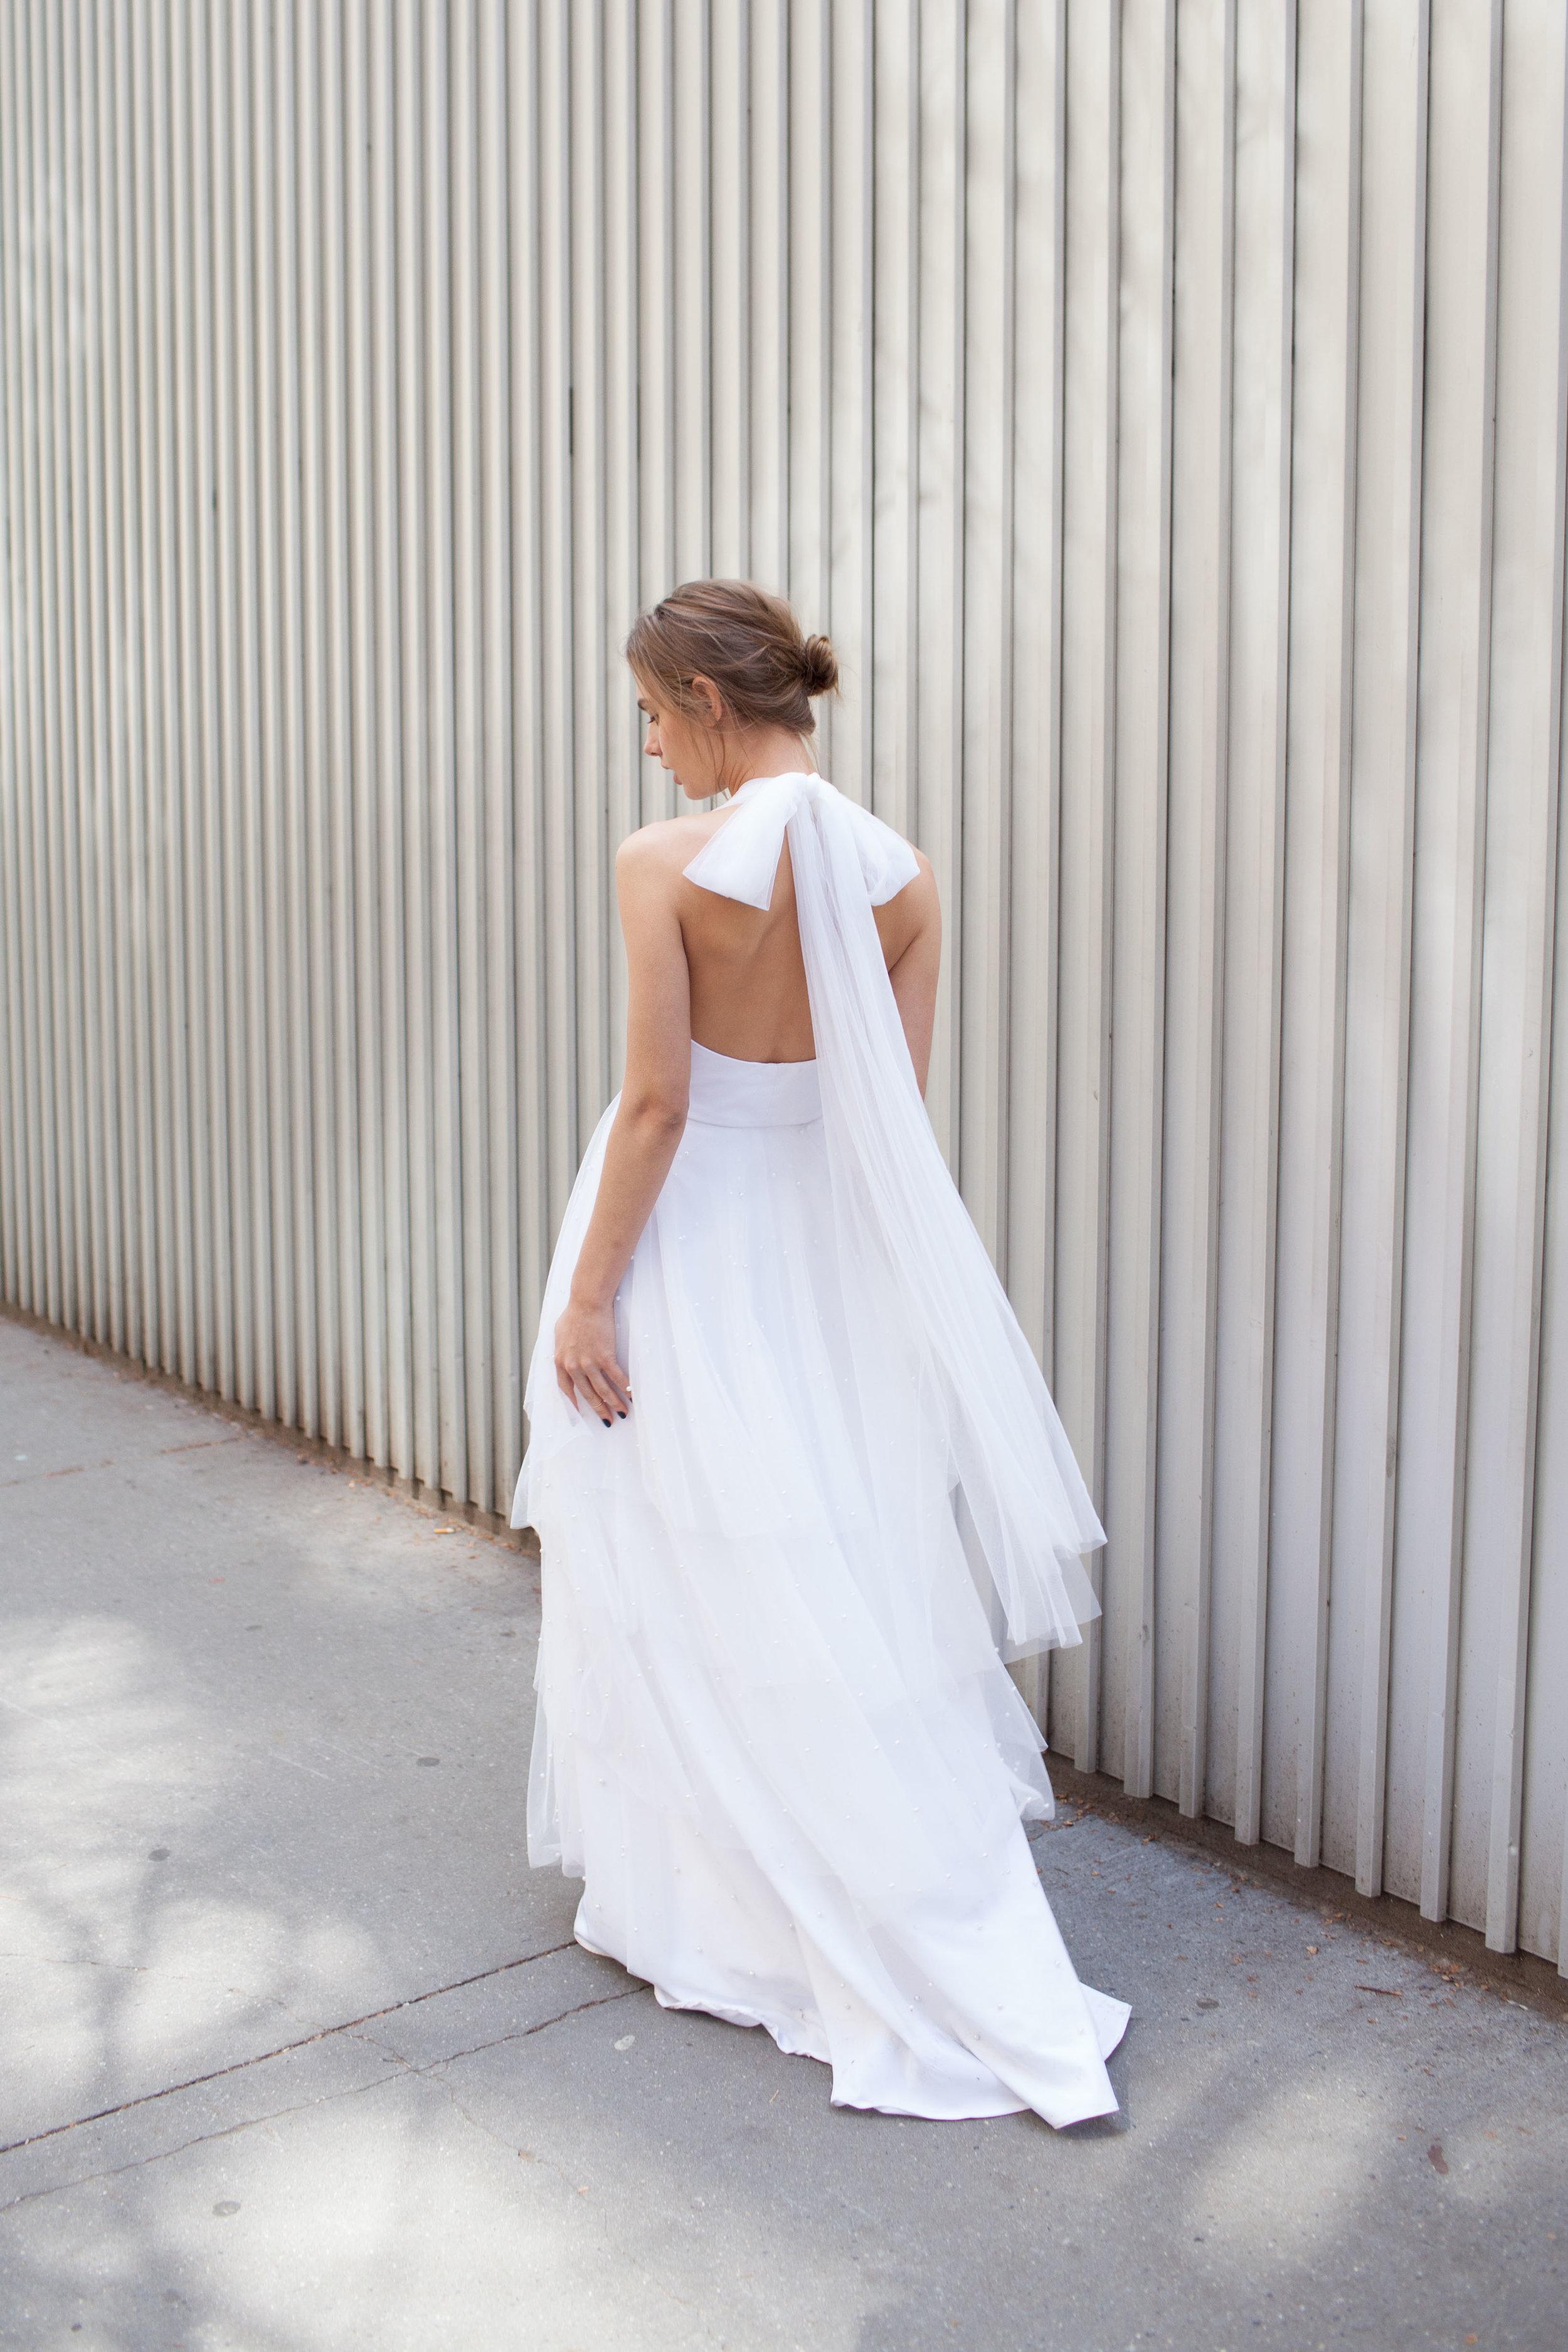 5.Samantha Sleeper - Natalie Probst Photography 019.jpg